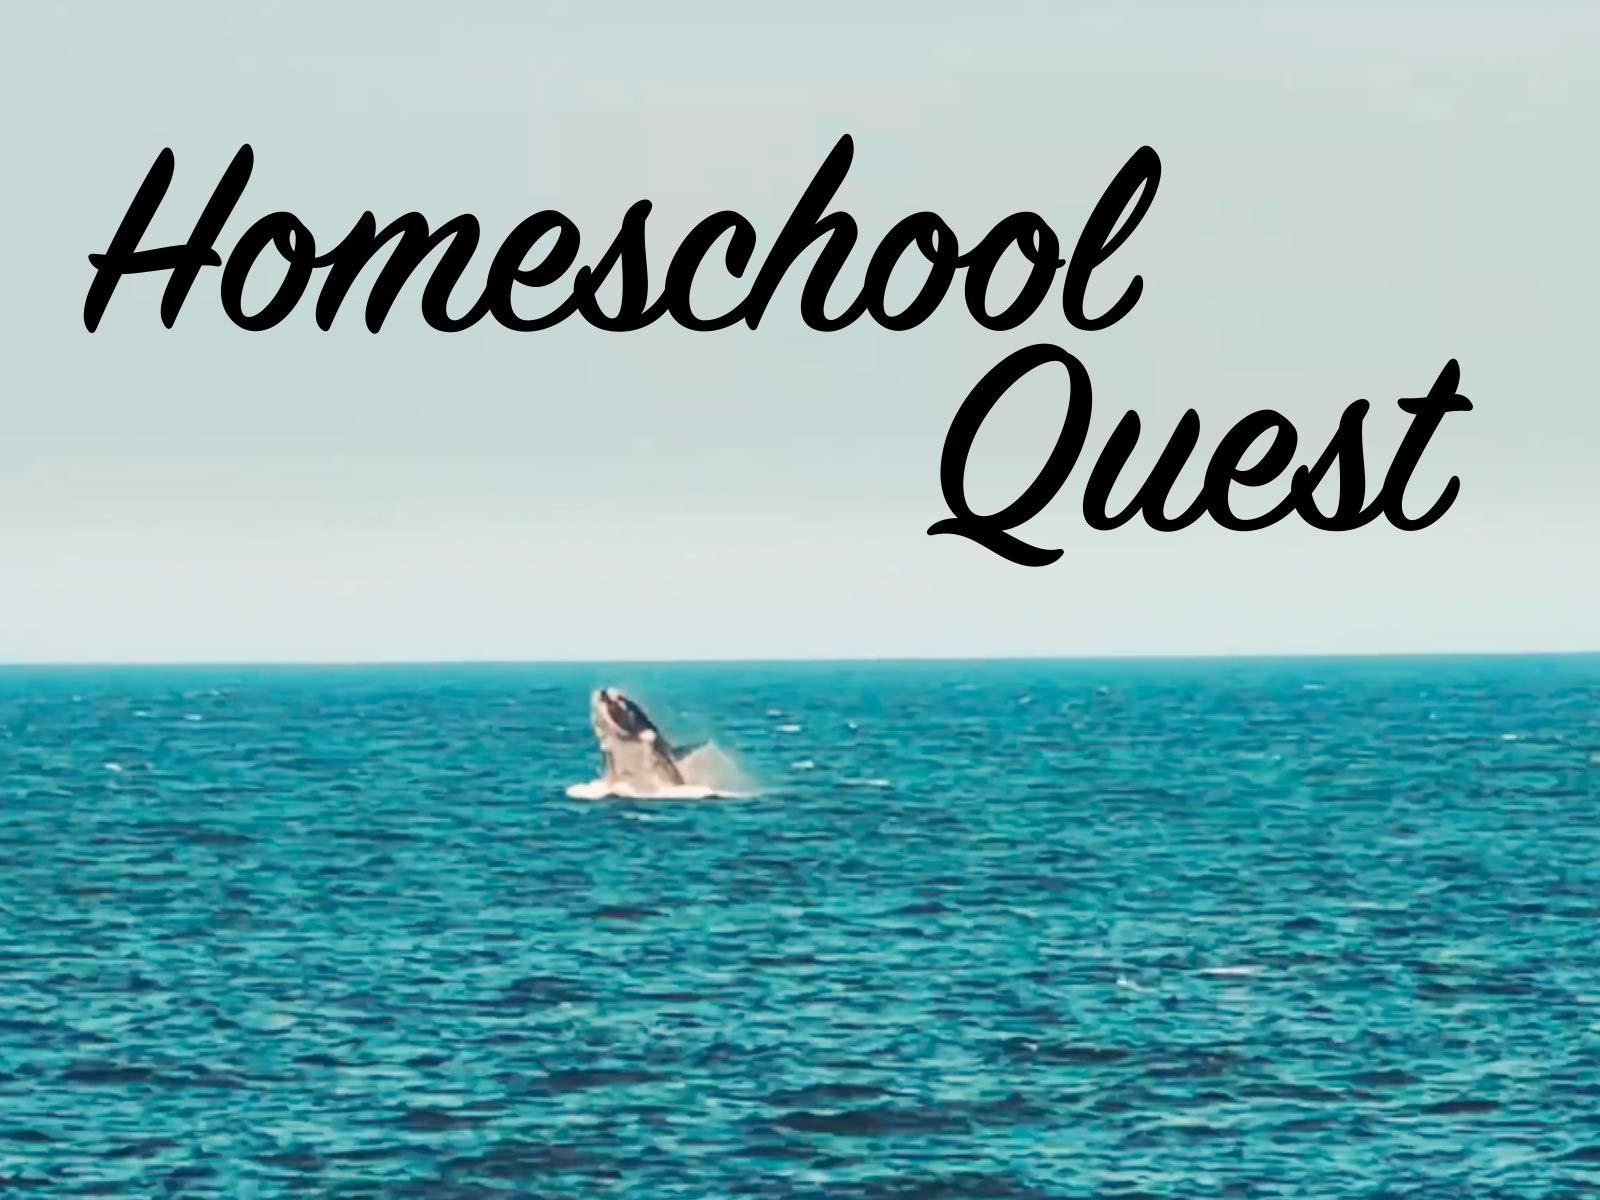 Homeschool Quest